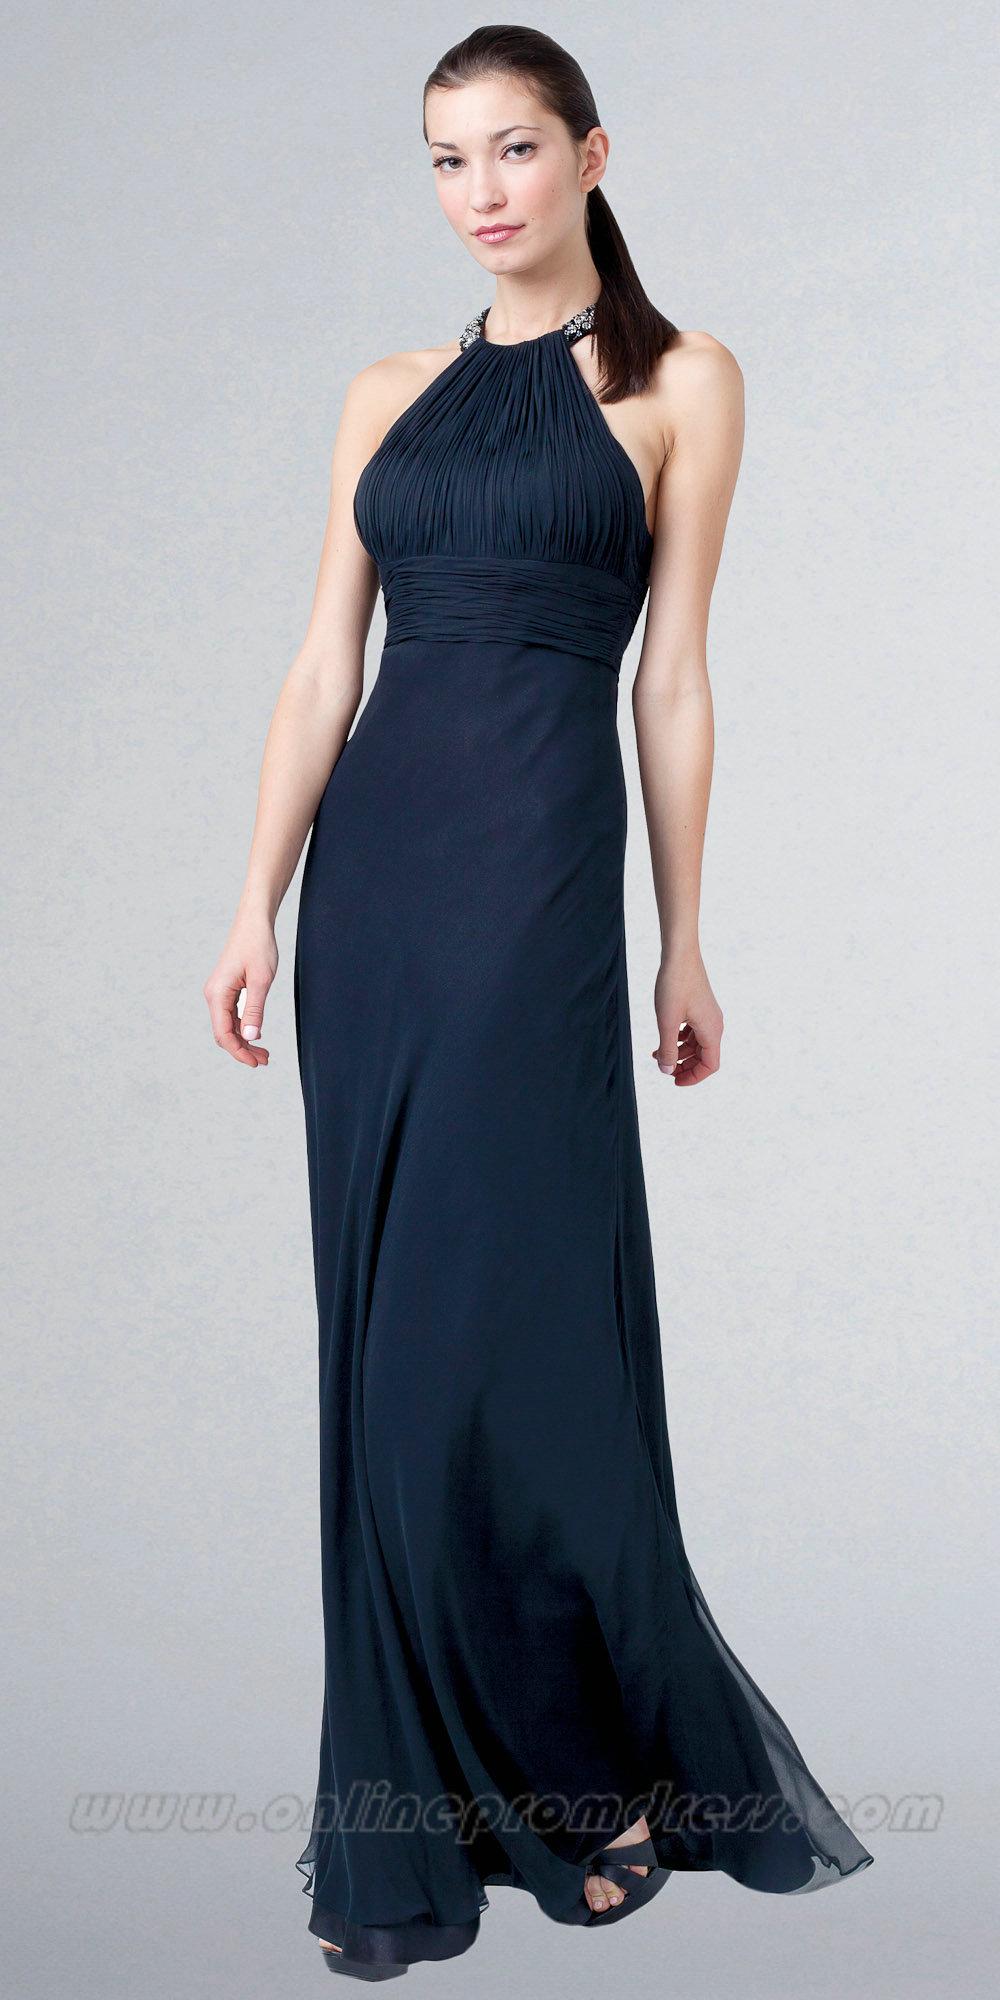 navy blue evening dresses photo - 1